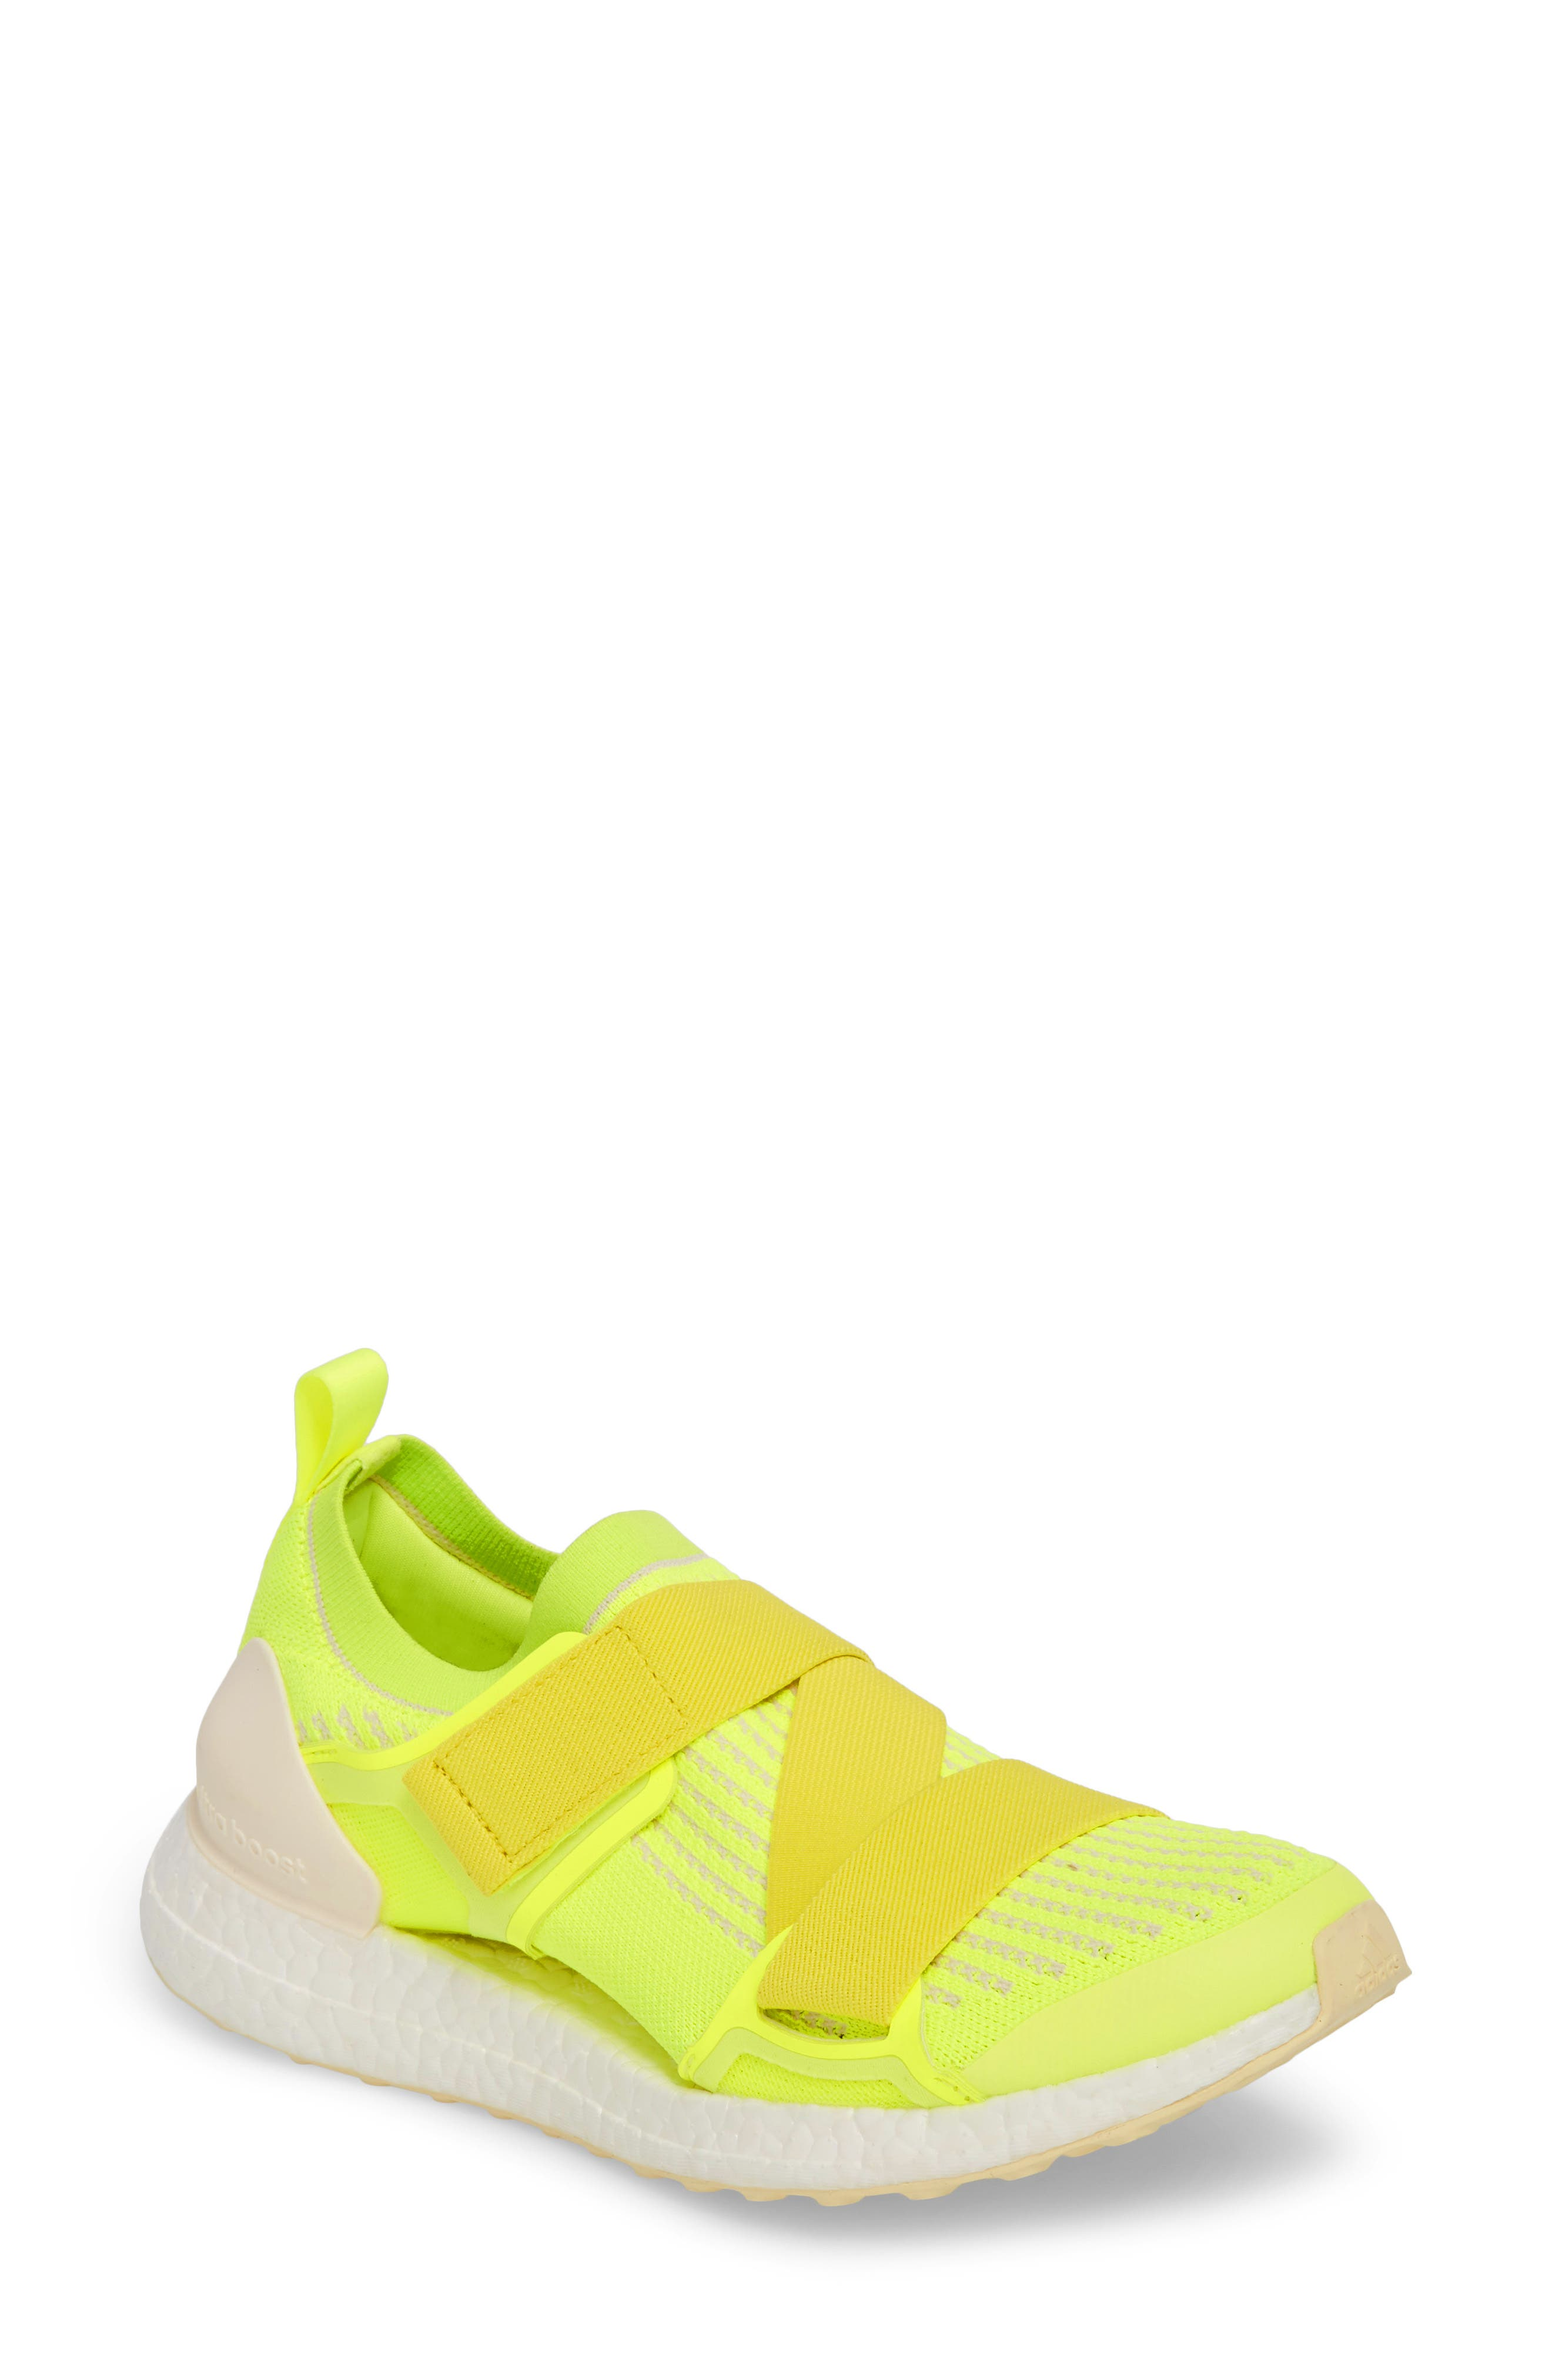 UltraBoost X Running Shoe,                         Main,                         color, SOLAR YELLOW/ YELLOW/ SUN